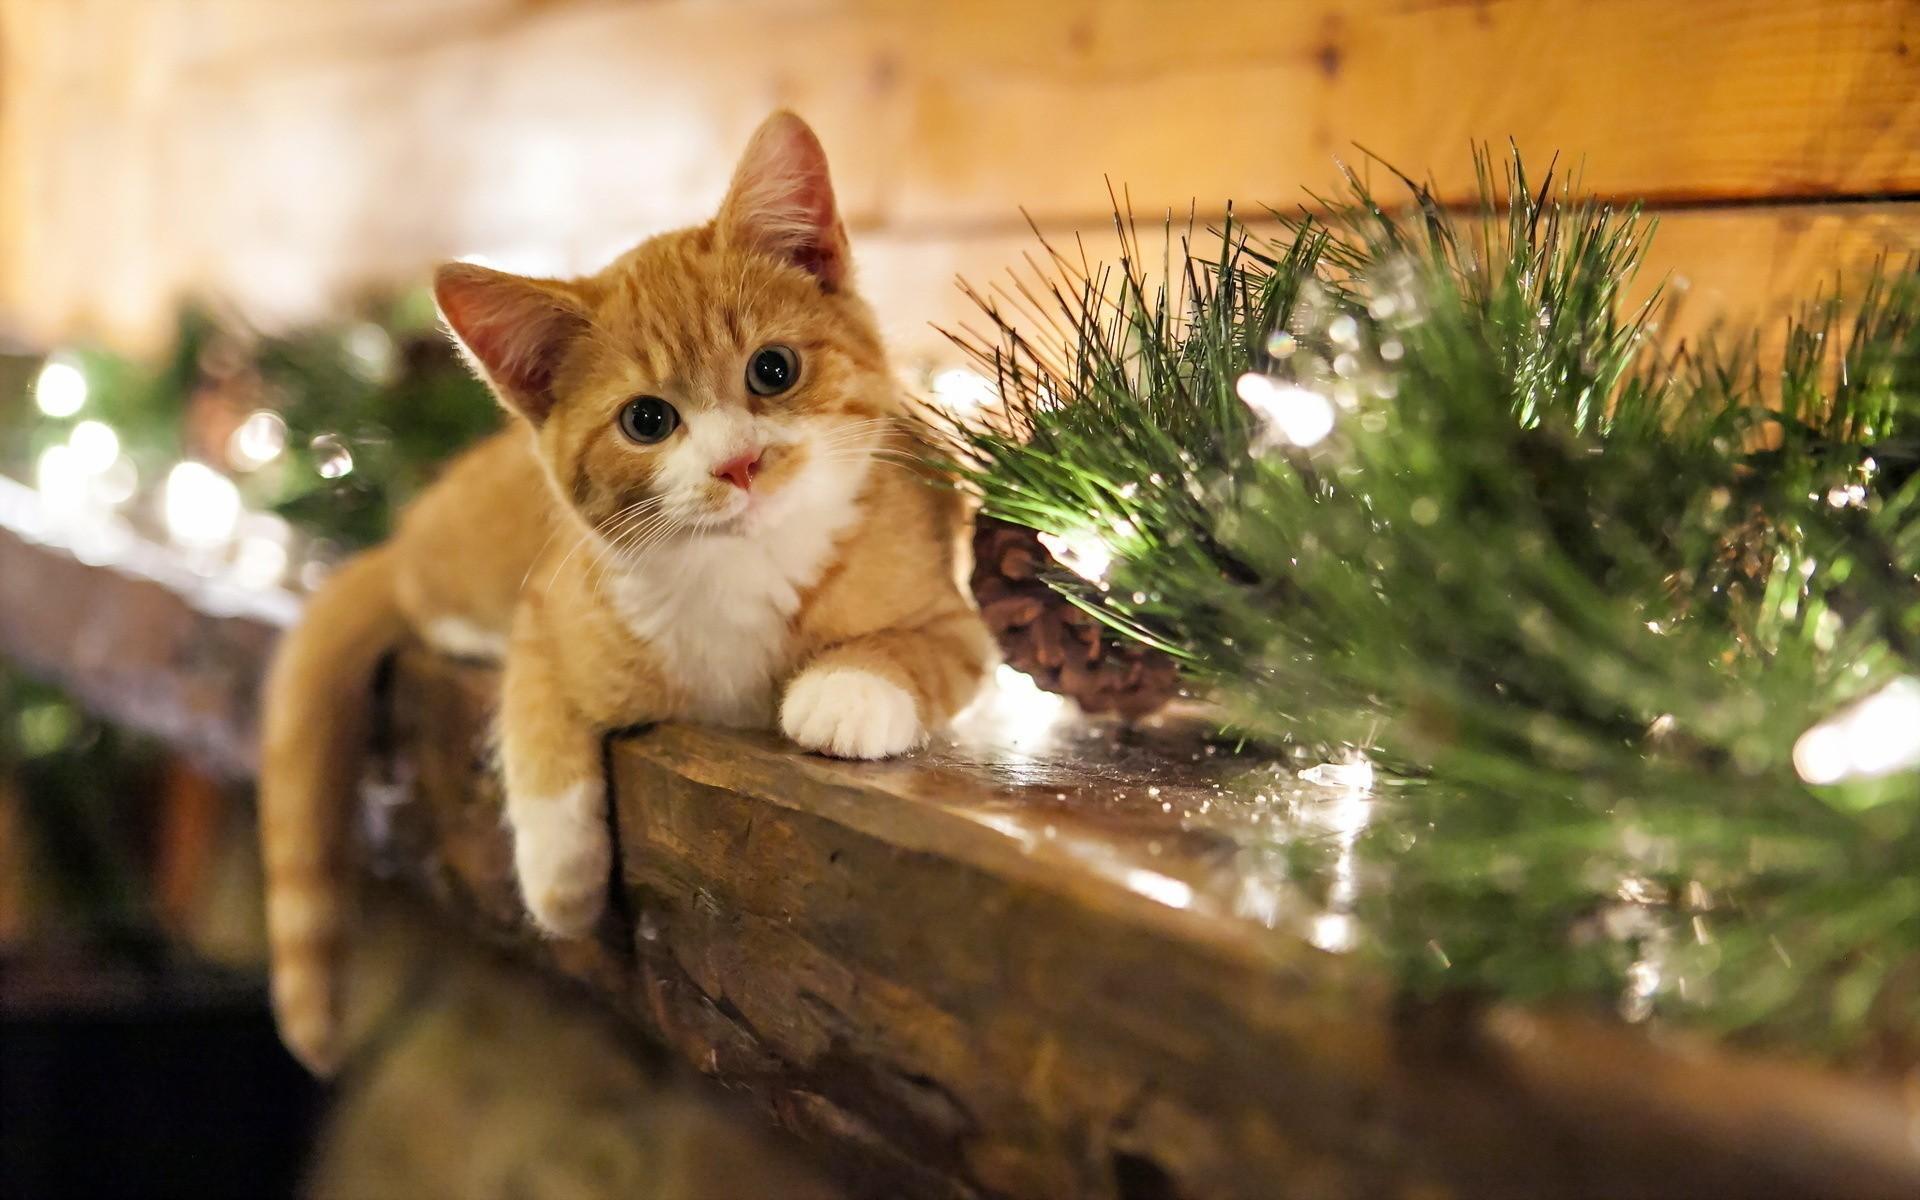 White-Cats-Christmas-Wallpaper-For-Android.jpg (1920×1200)   Wallpapers    Pinterest   Wallpaper, Mobile wallpaper and Desktop backgrounds